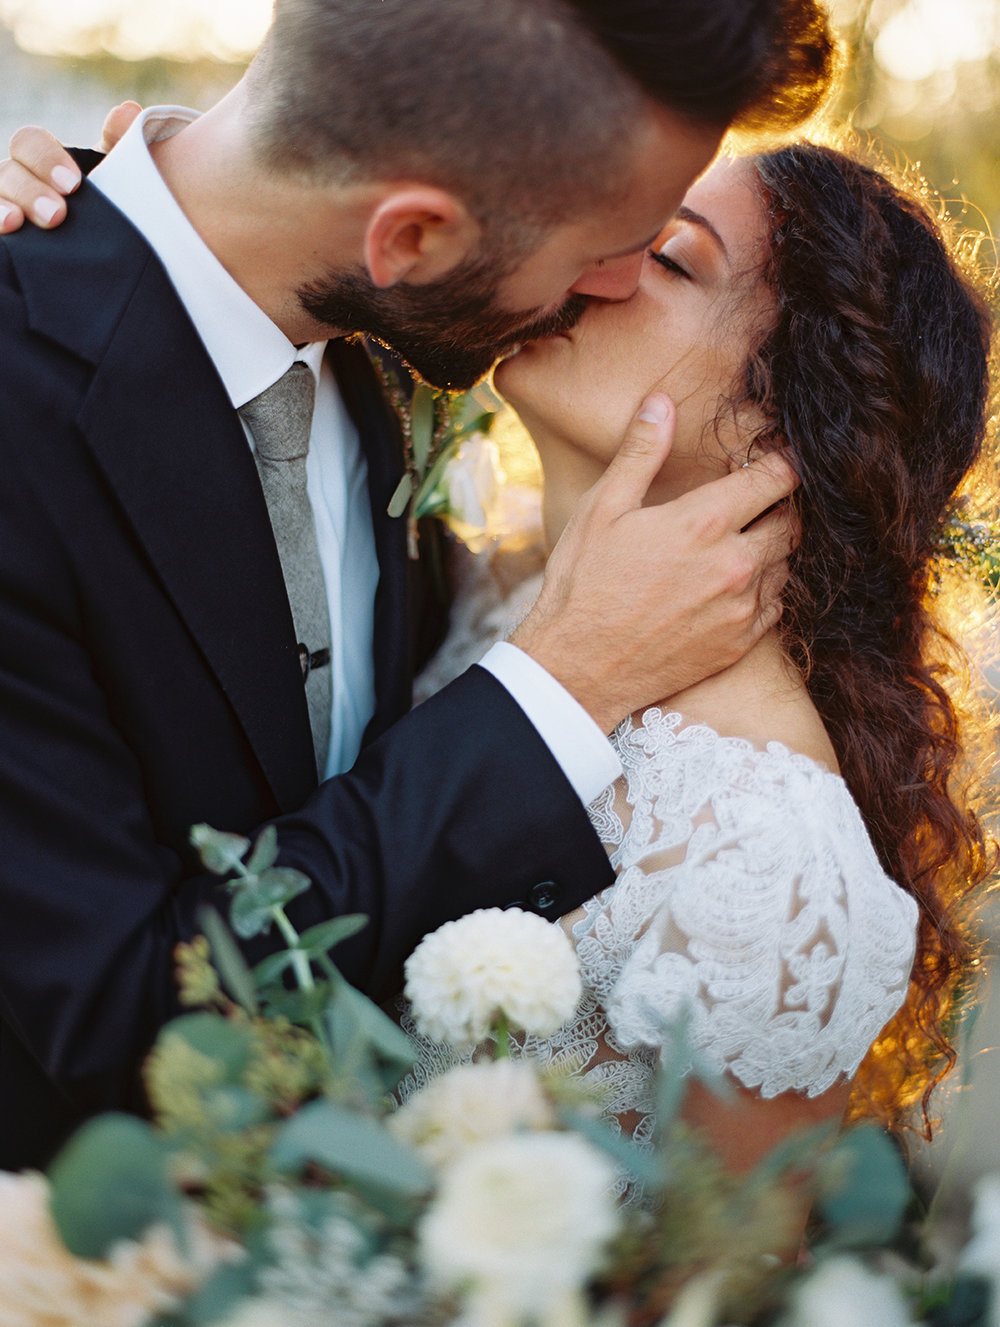 299-brian-sarra-los-angeles-wedding-brumley-wells-photography.jpg